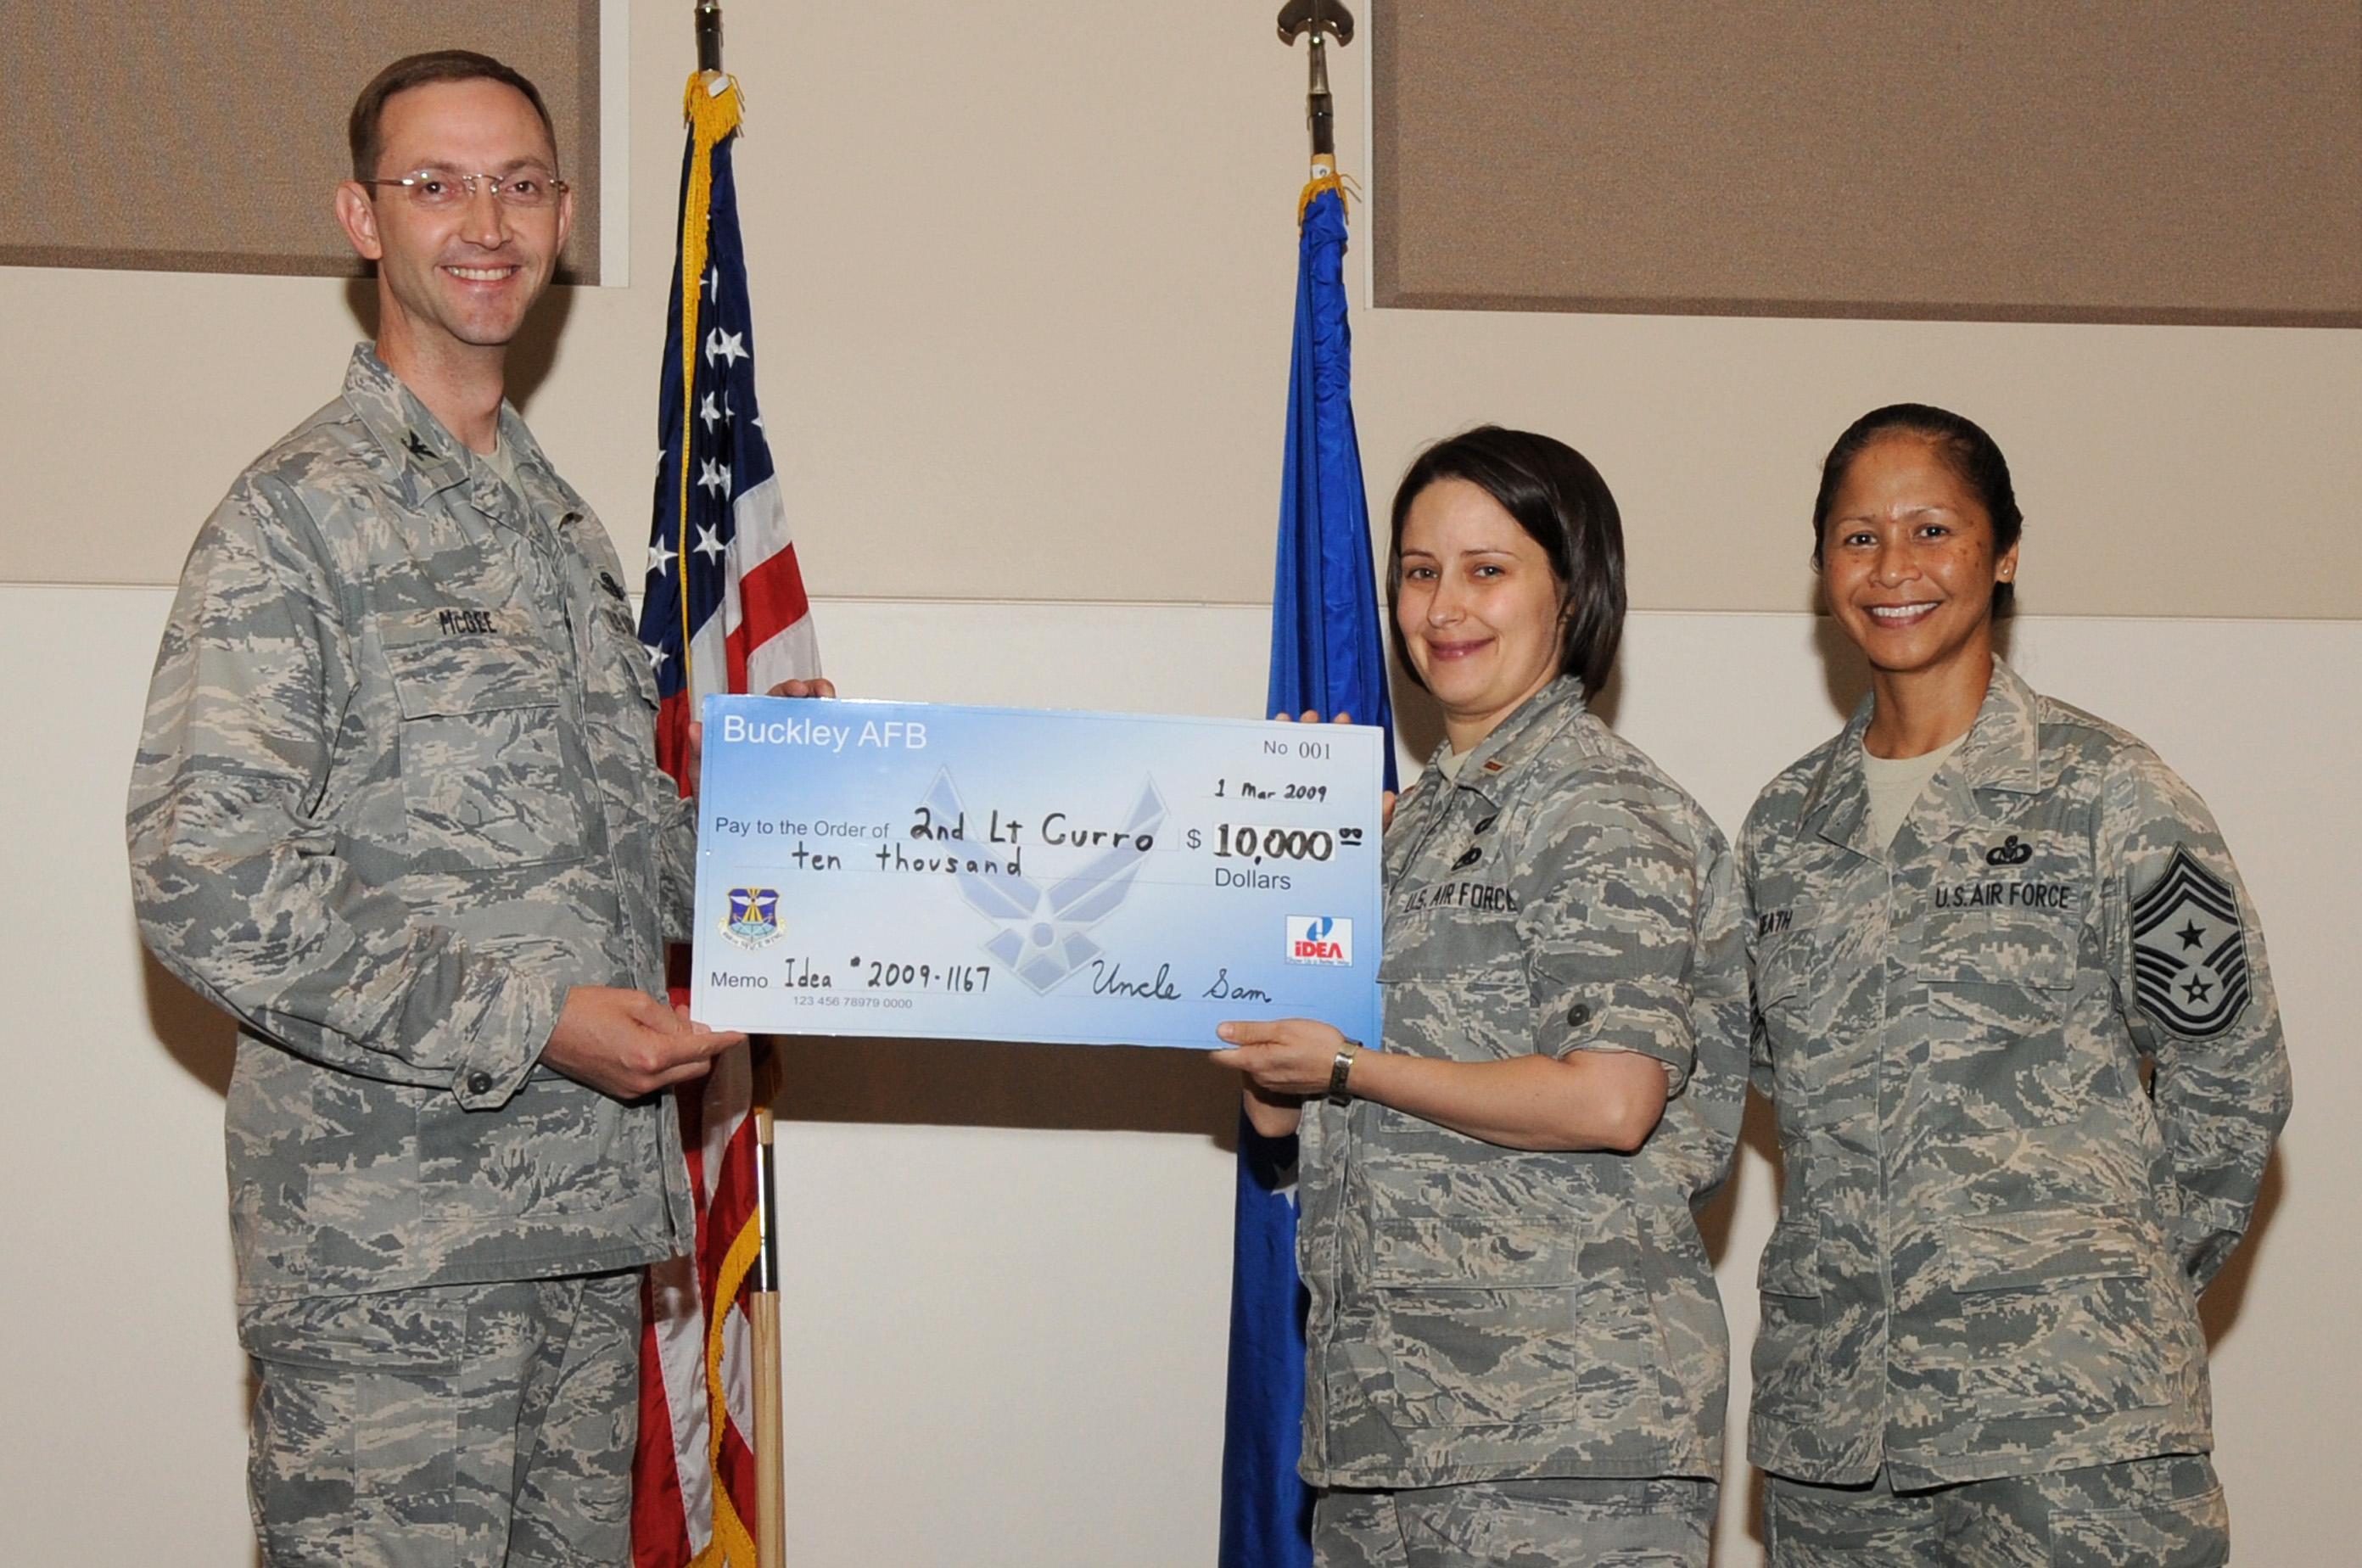 Military Pay Chart 2009: IDEA program rewards lieutenant $10000 e Buckley Air Force Base ,Chart